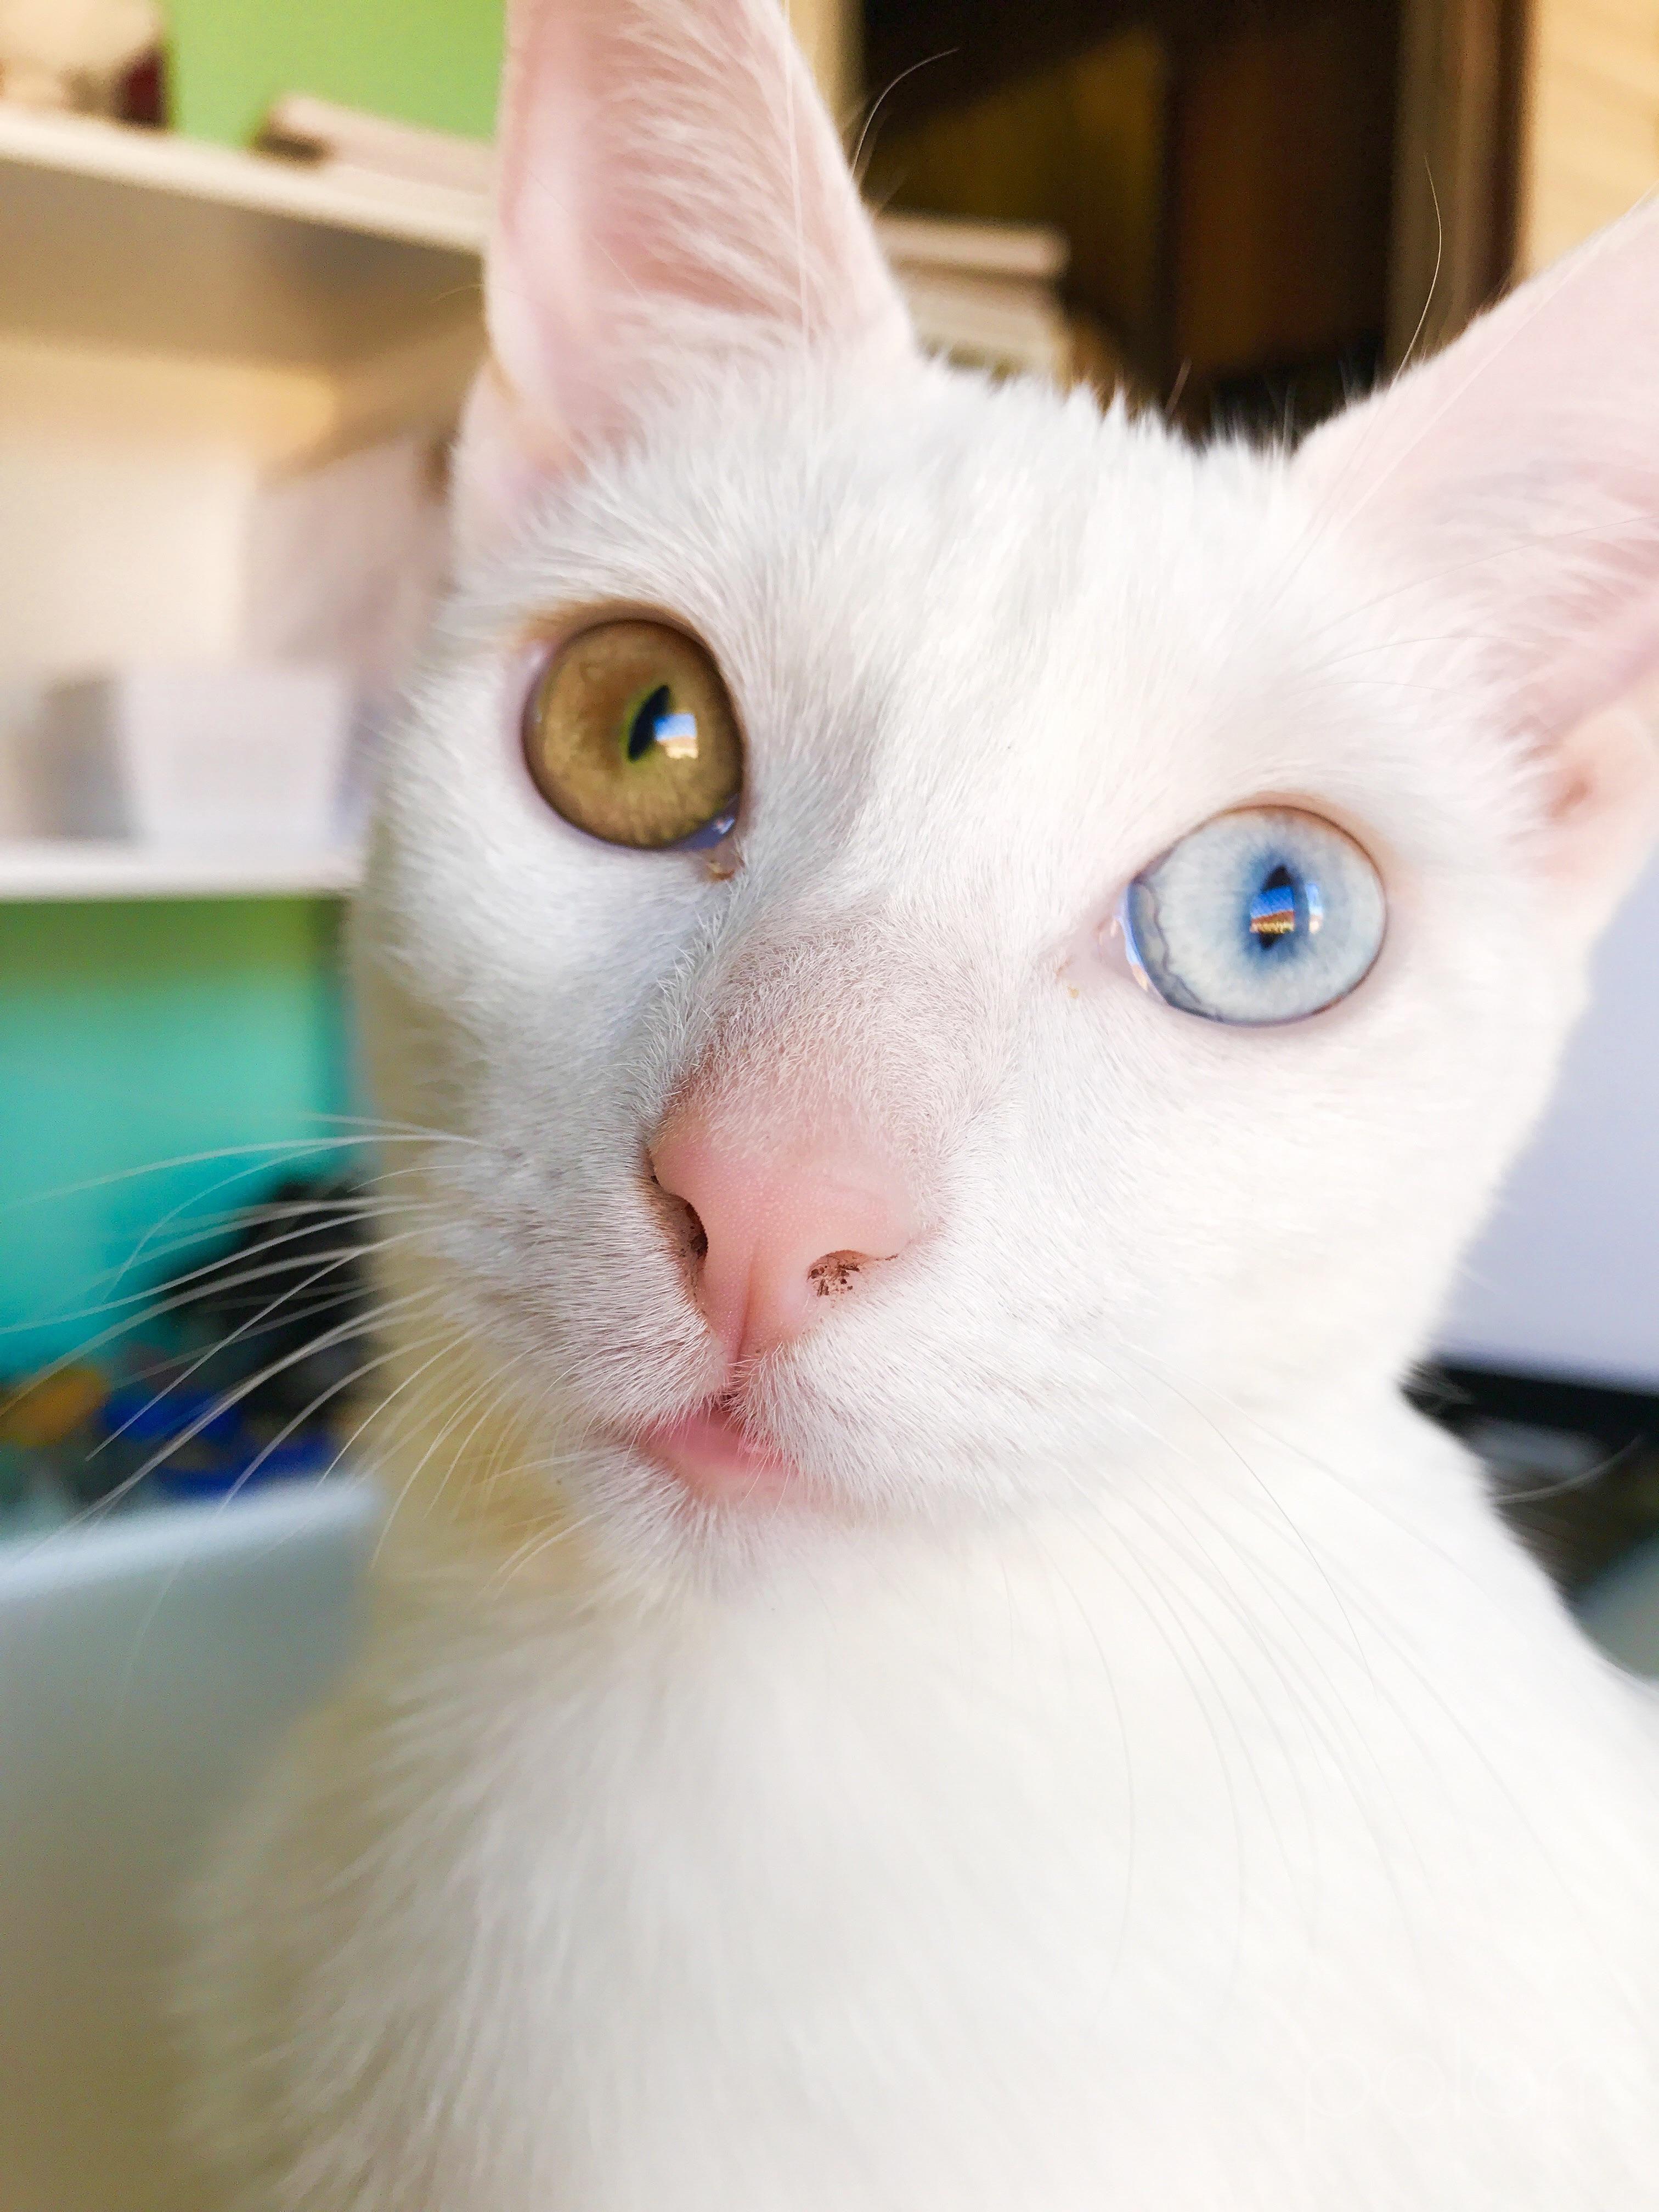 My little girl with heterochromia iridium  She is also deaf